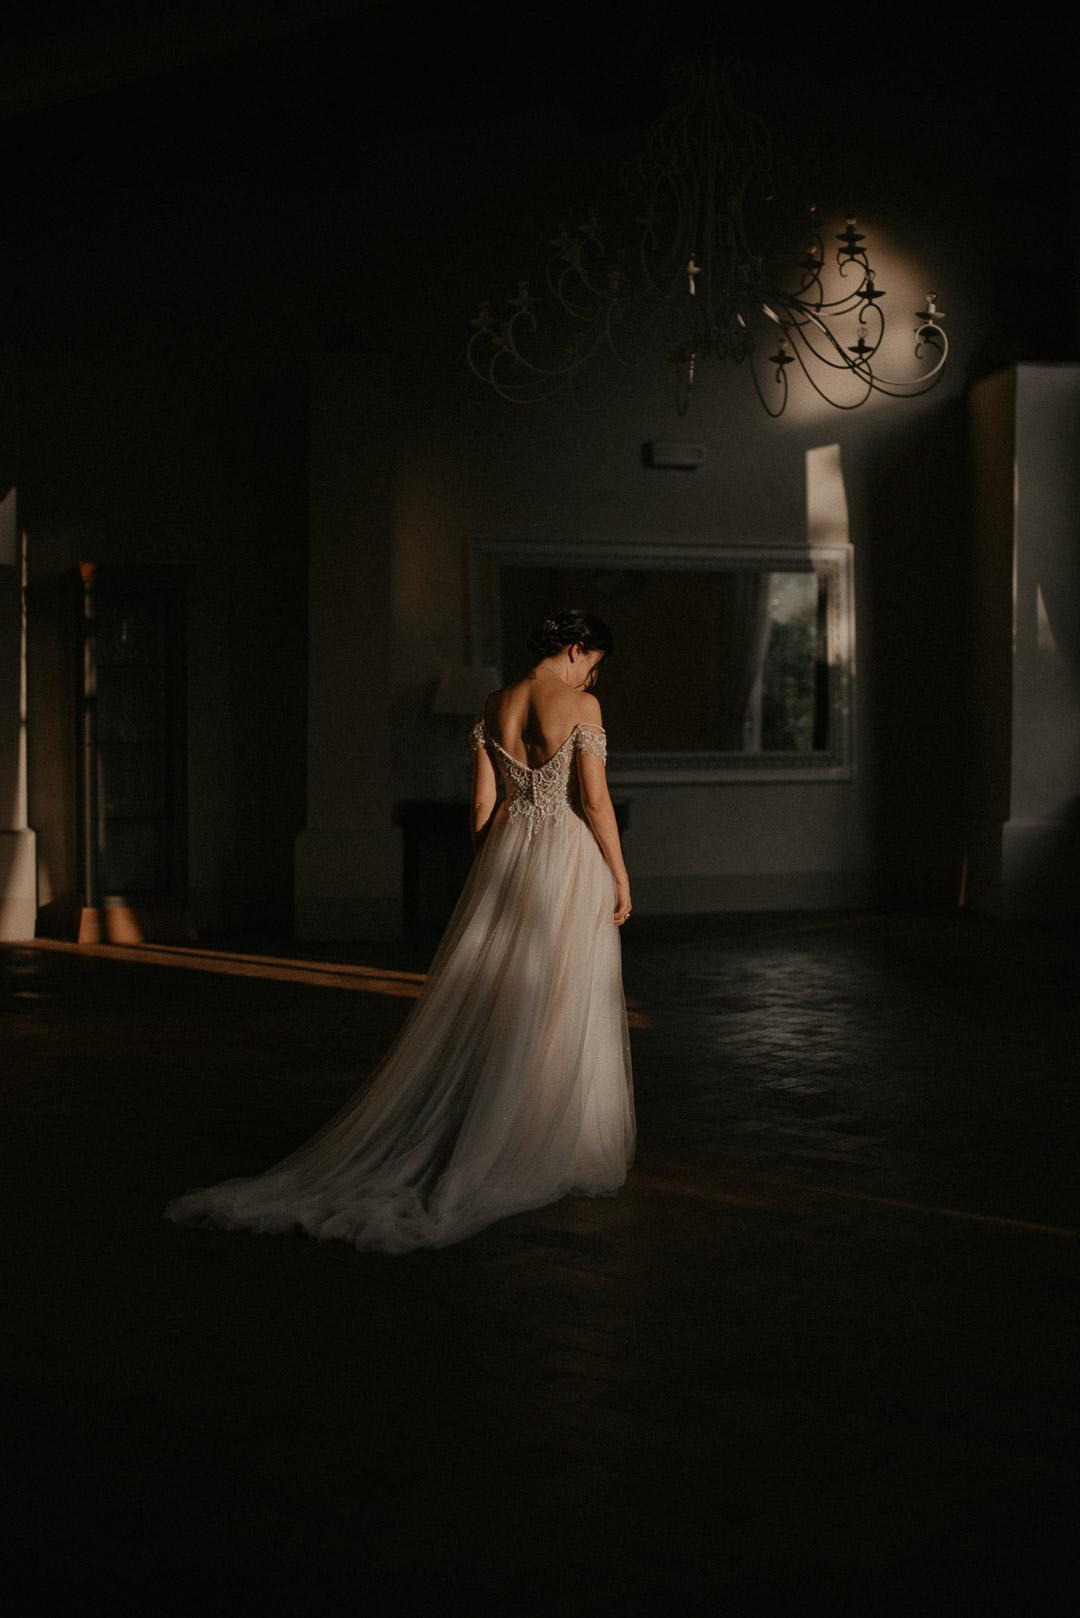 wedding-photographer-destination-fineart-bespoke-reportage-tuscany-villascorzi-vivianeizzo-spazio46-113